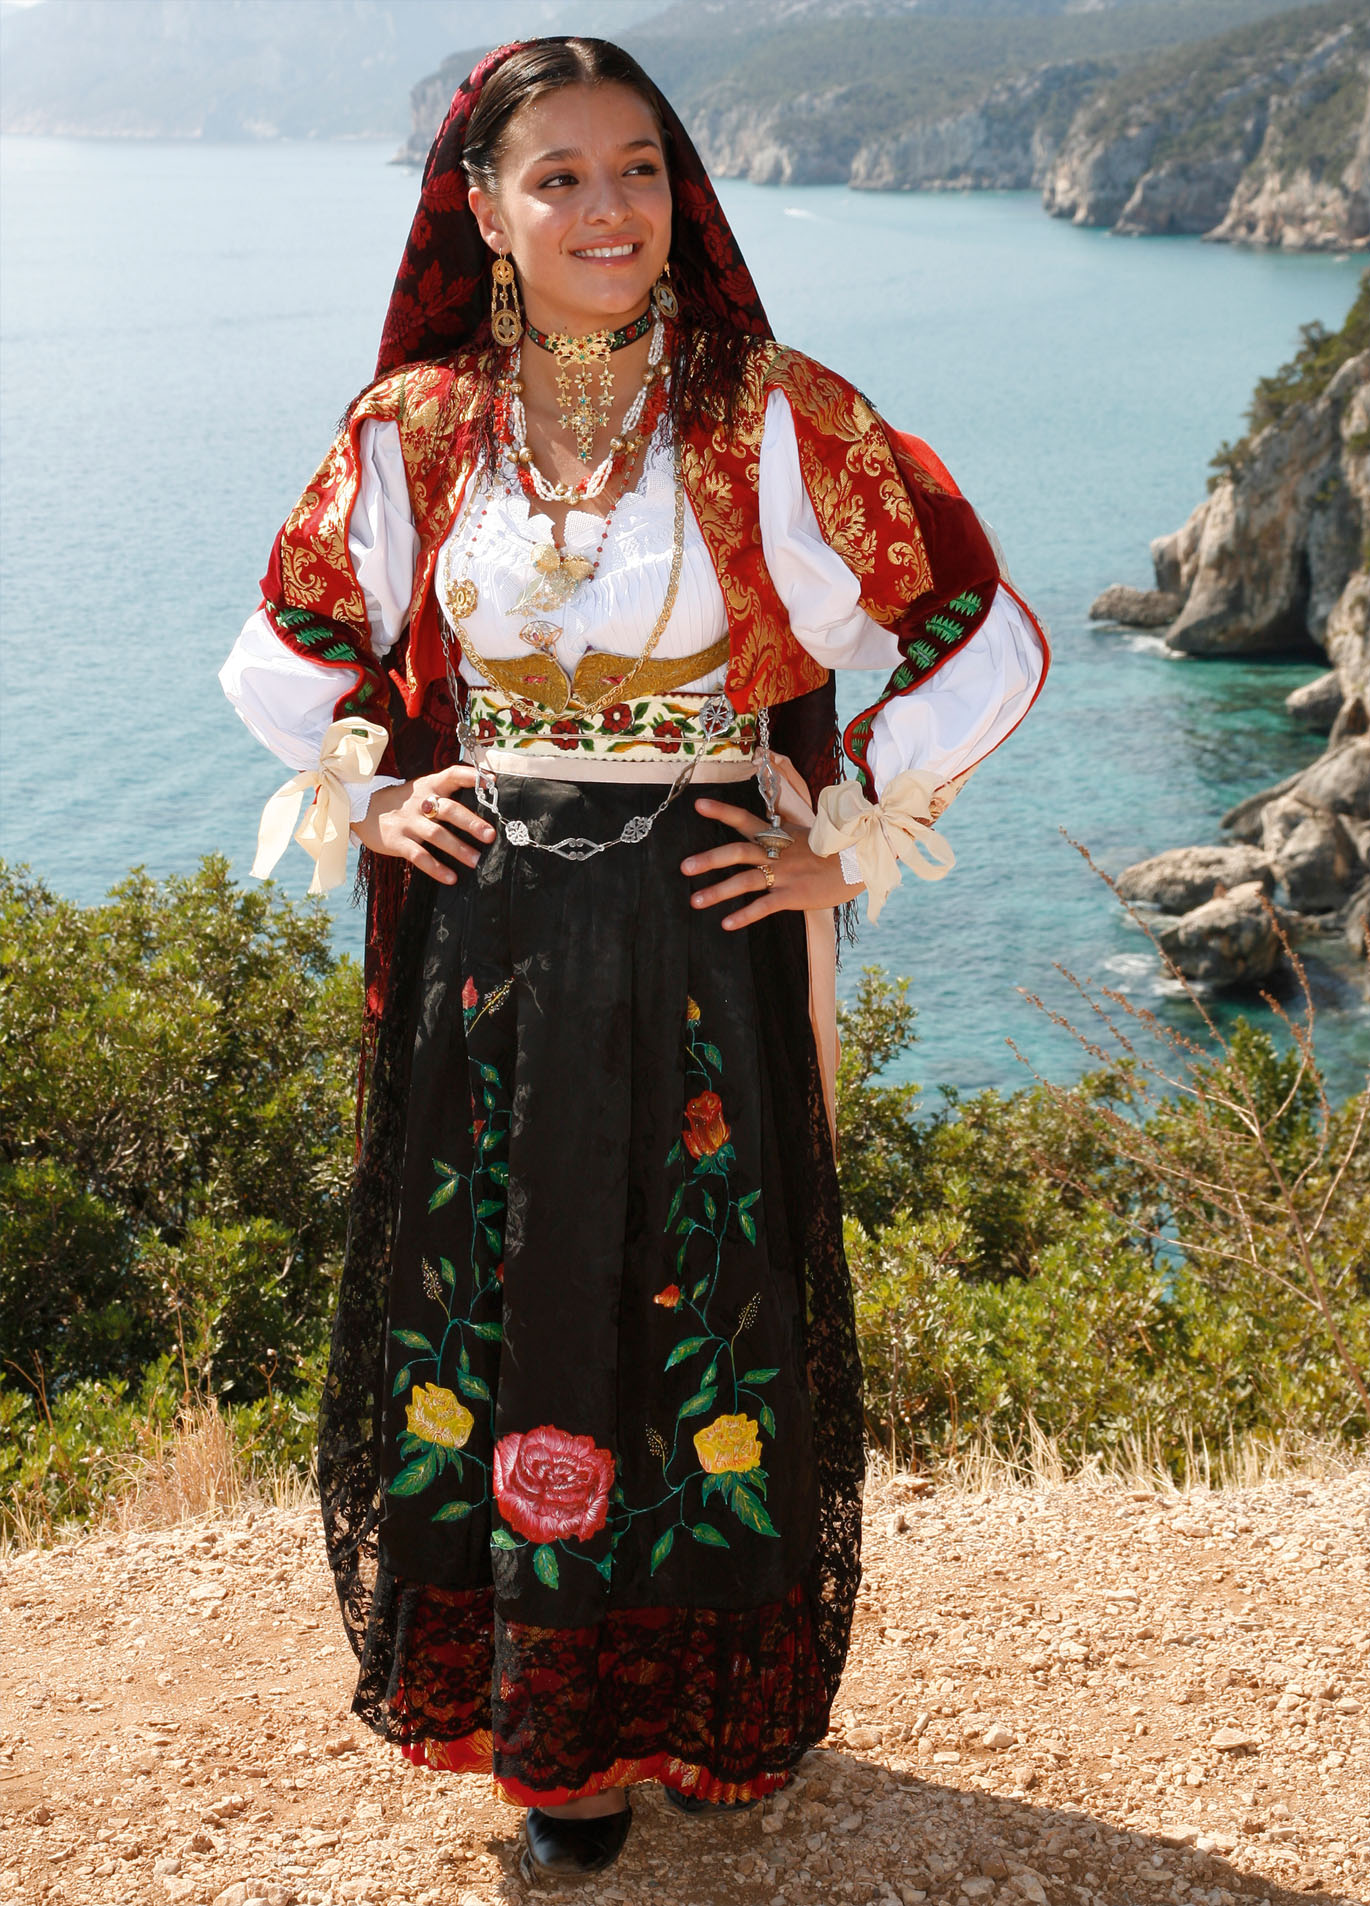 1000+ images about Costumi sardi on Pinterest | Sardinia ...